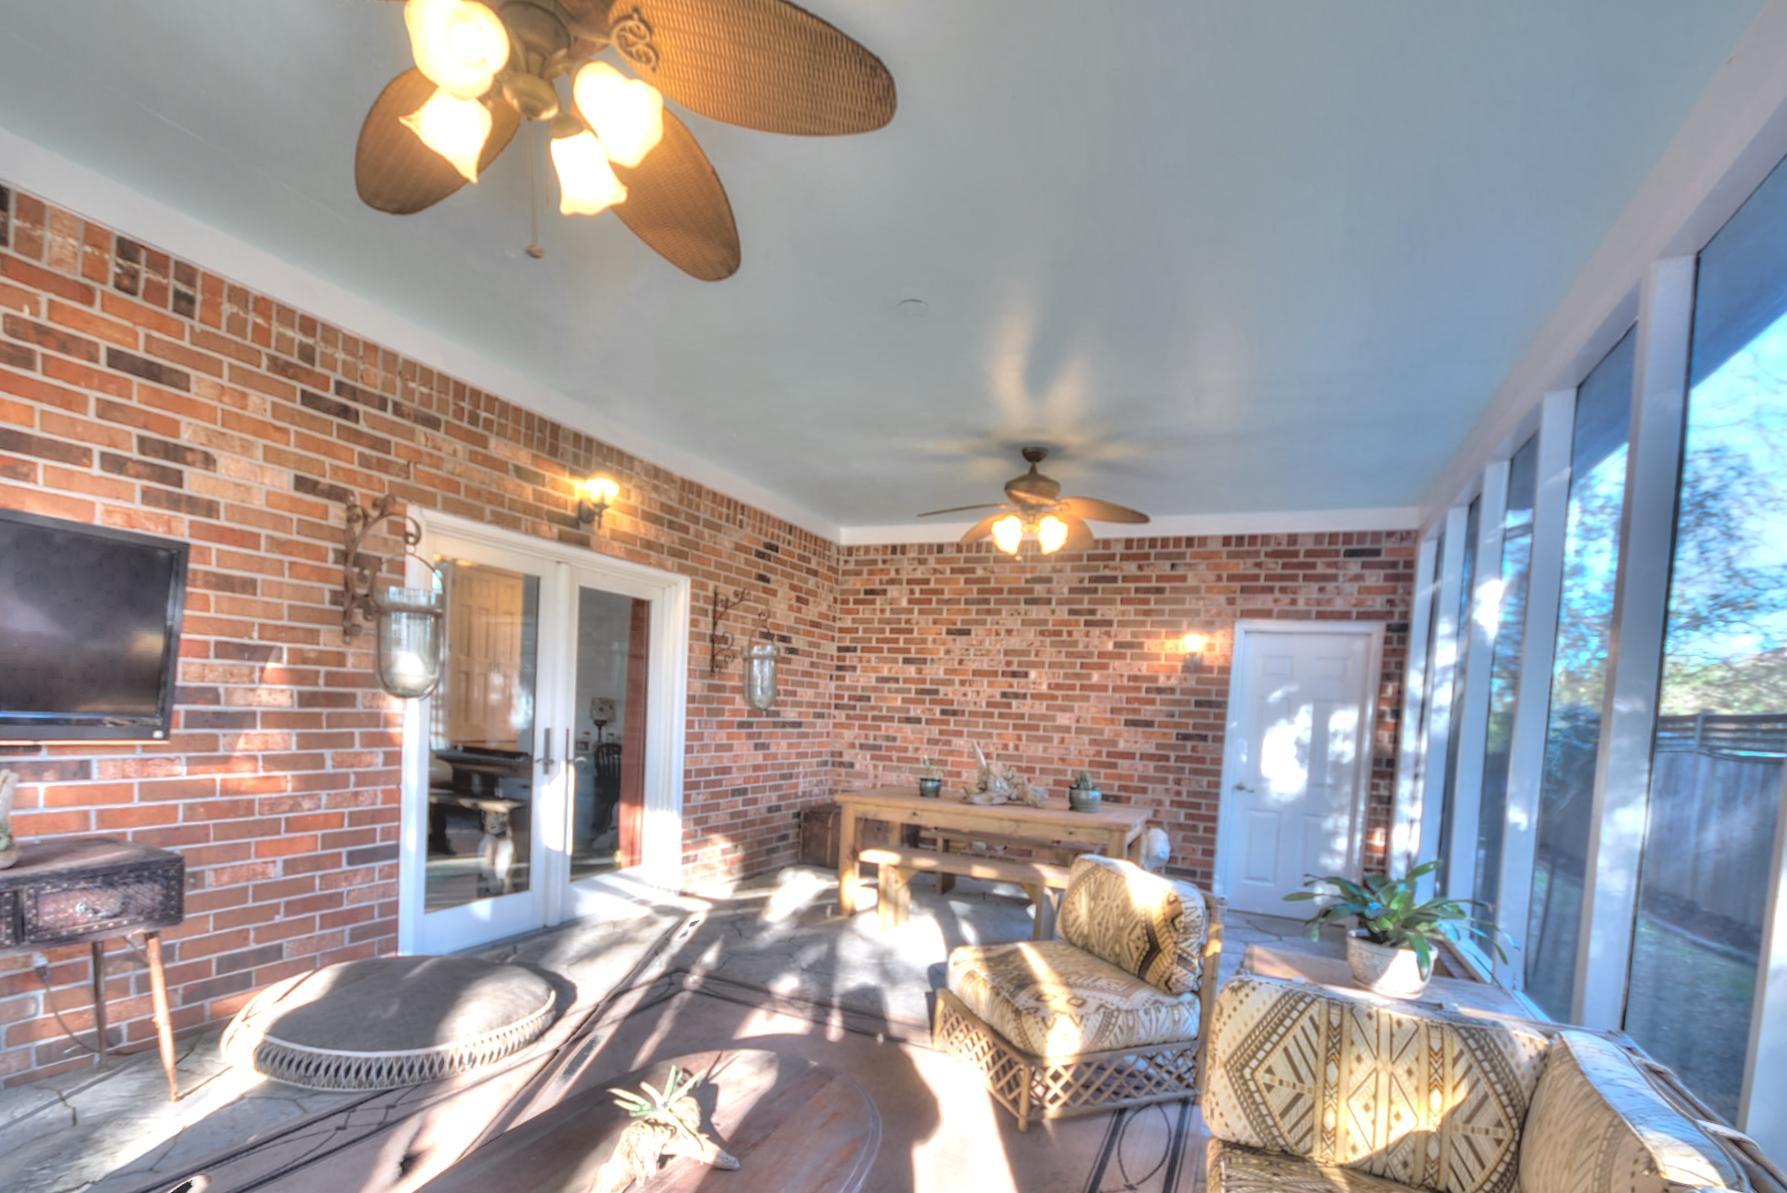 Capri Isles Homes For Sale - 213 Wappoo, Charleston, SC - 49